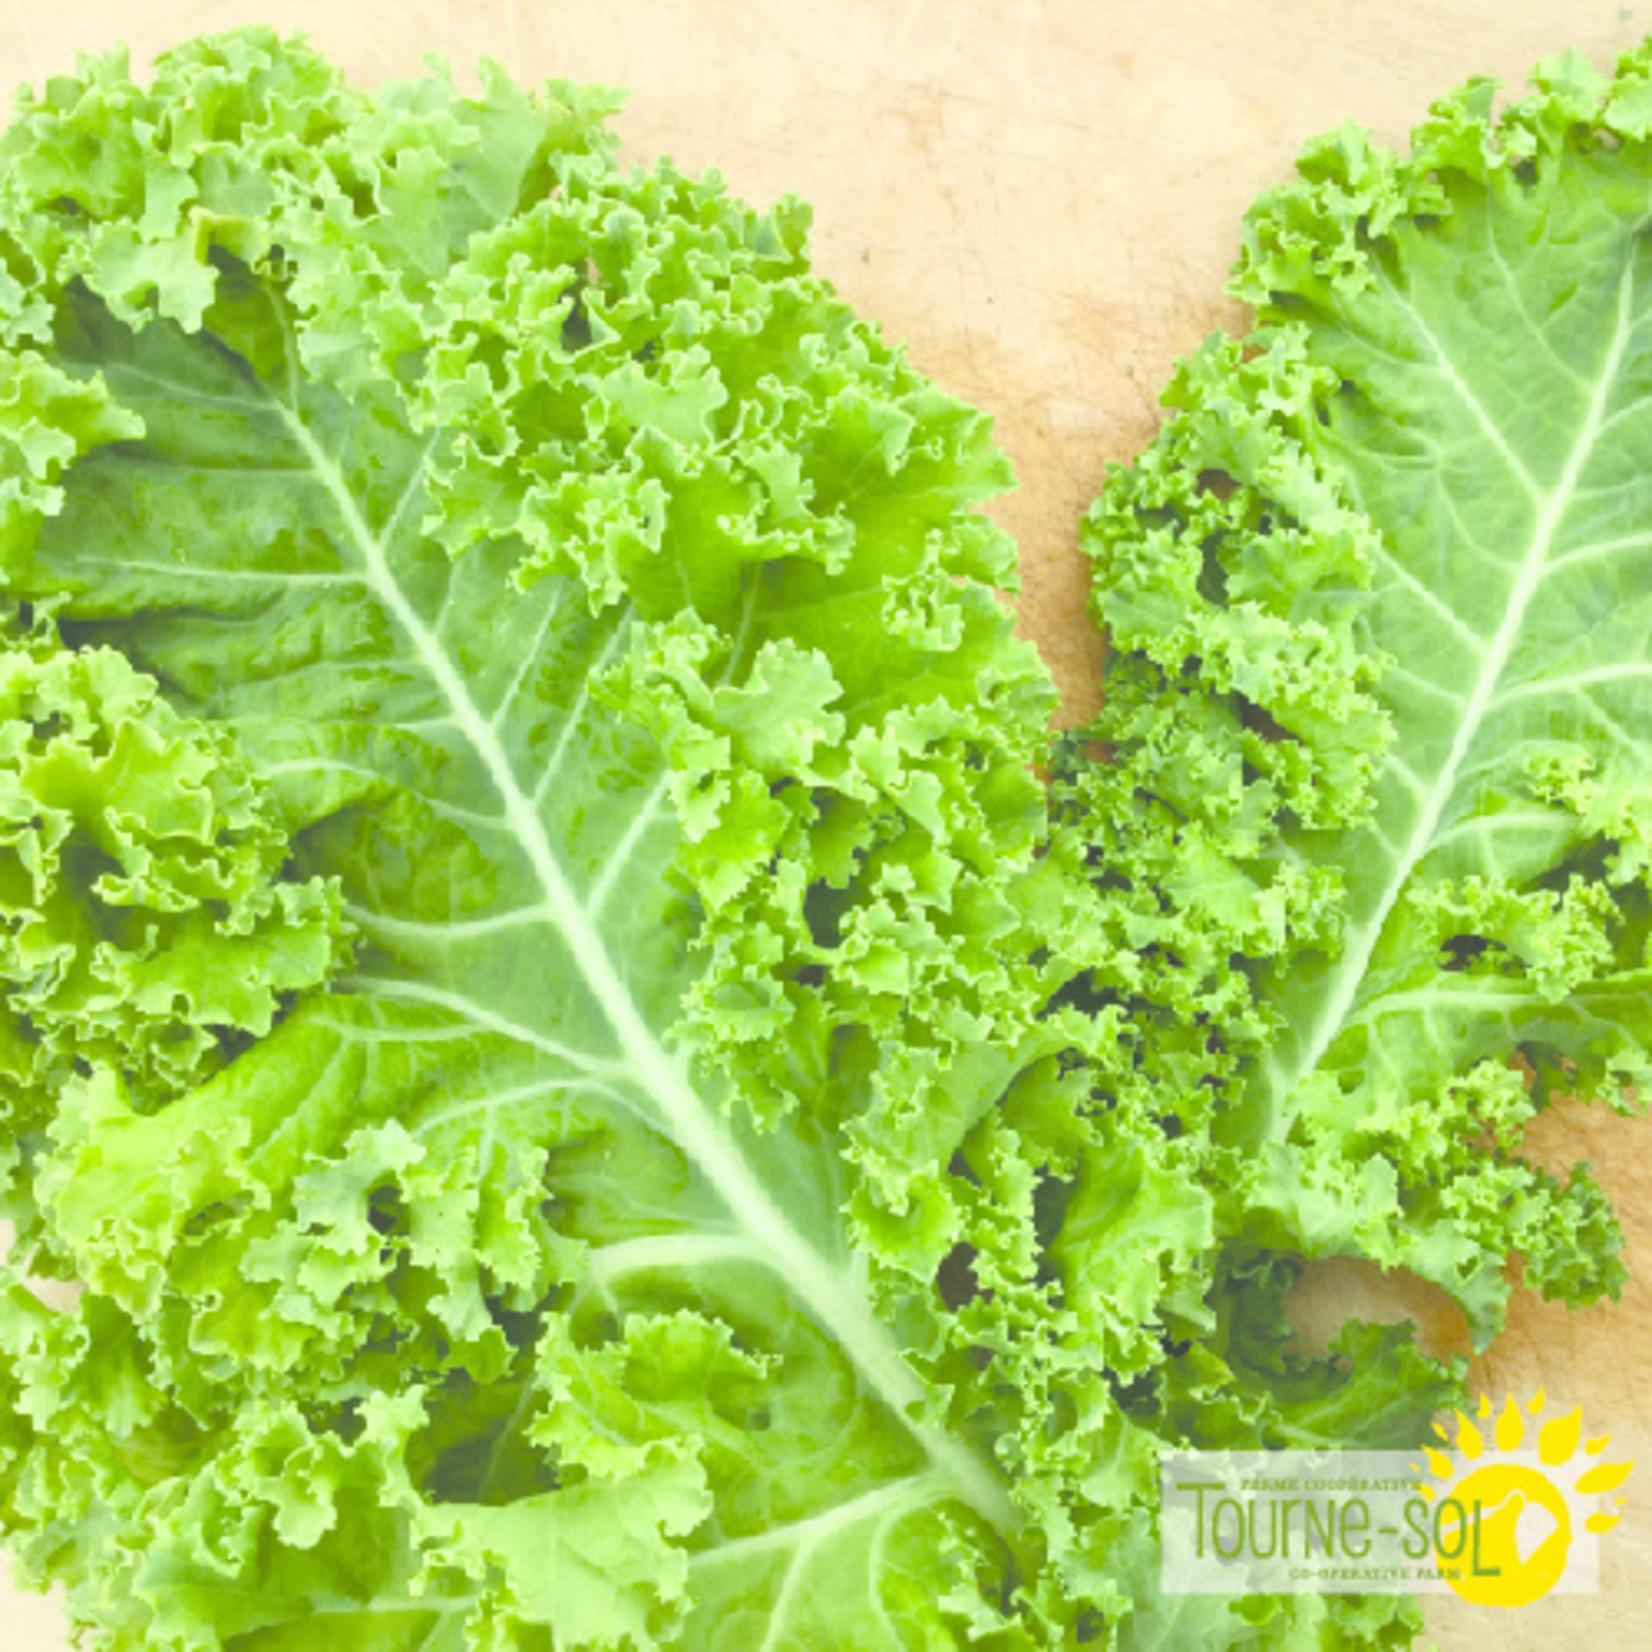 Tourne-Sol Kale Vates